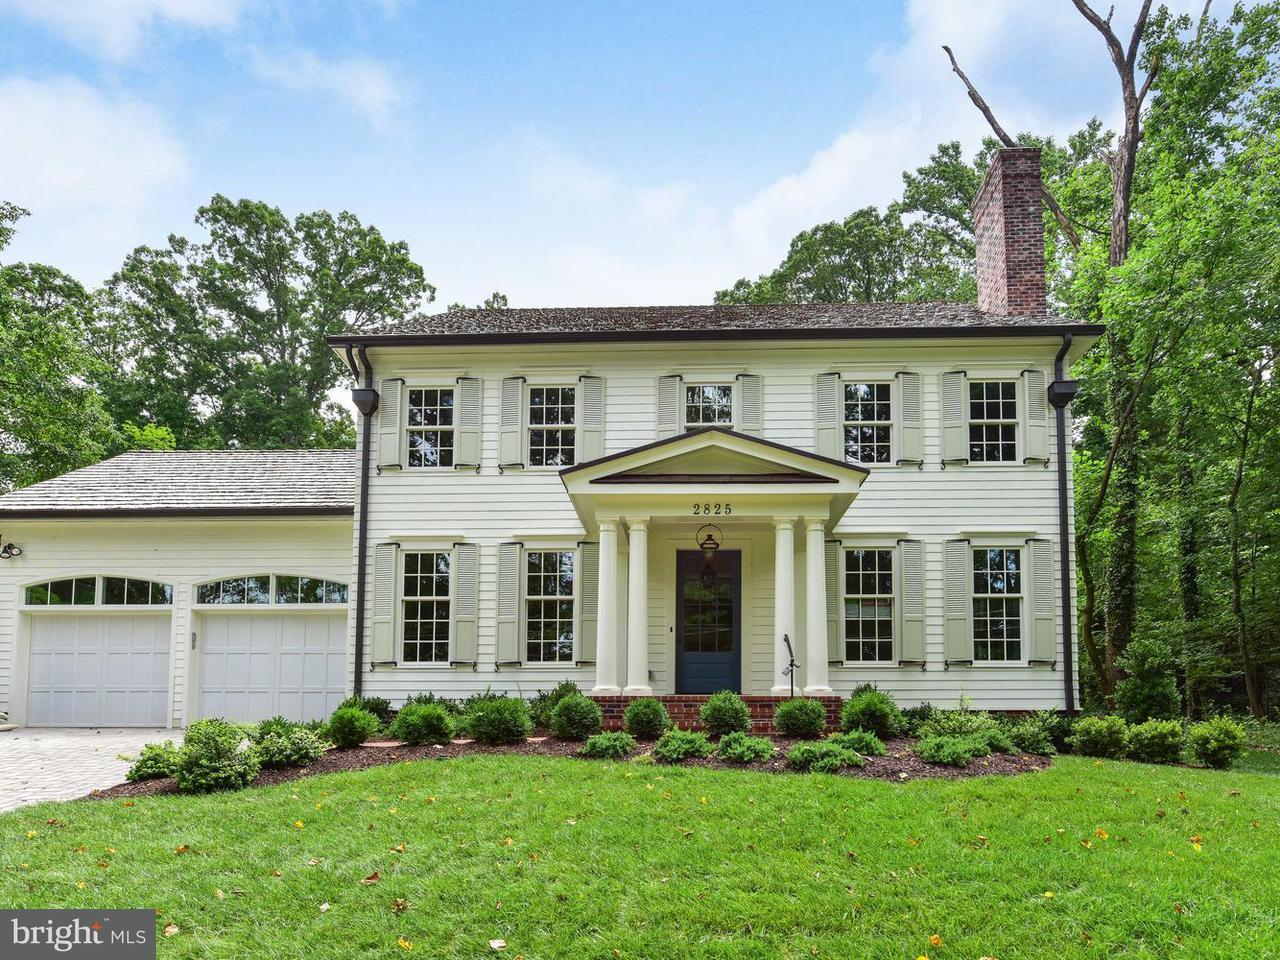 Single Family Home for Sale at 2825 ARIZONA ST N 2825 ARIZONA ST N Arlington, Virginia 22213 United States